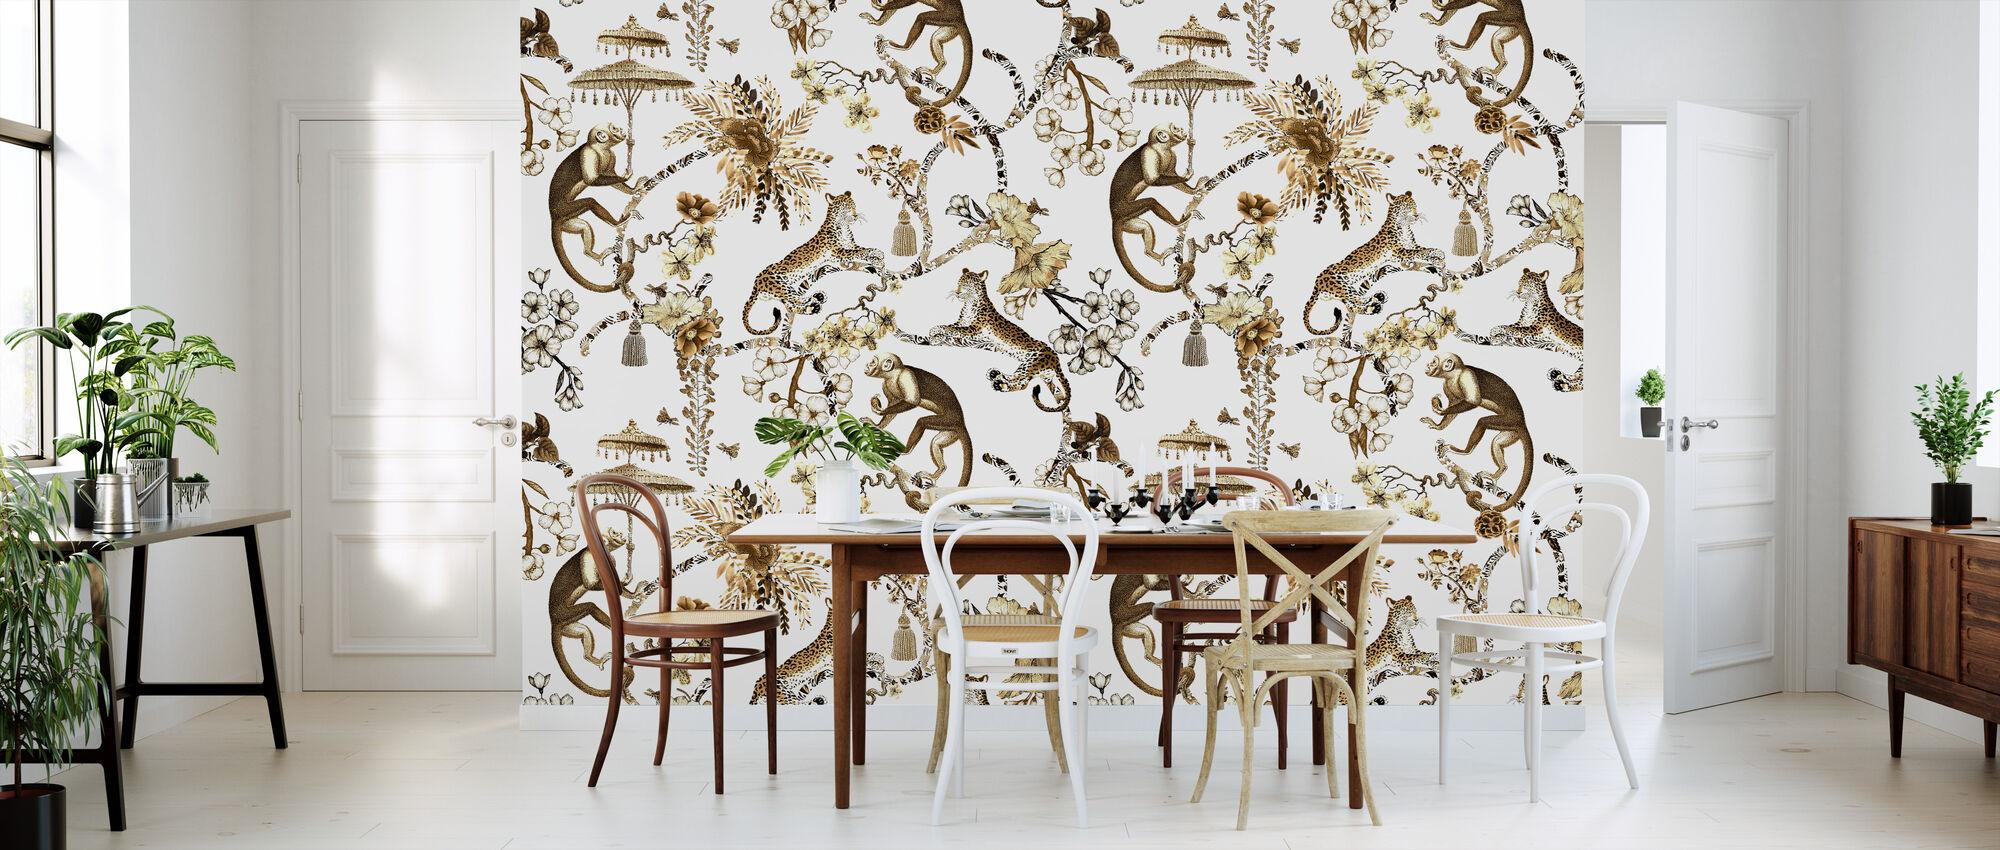 Whimsy Garden Brown Chinoiserie - Wallpaper - Kitchen